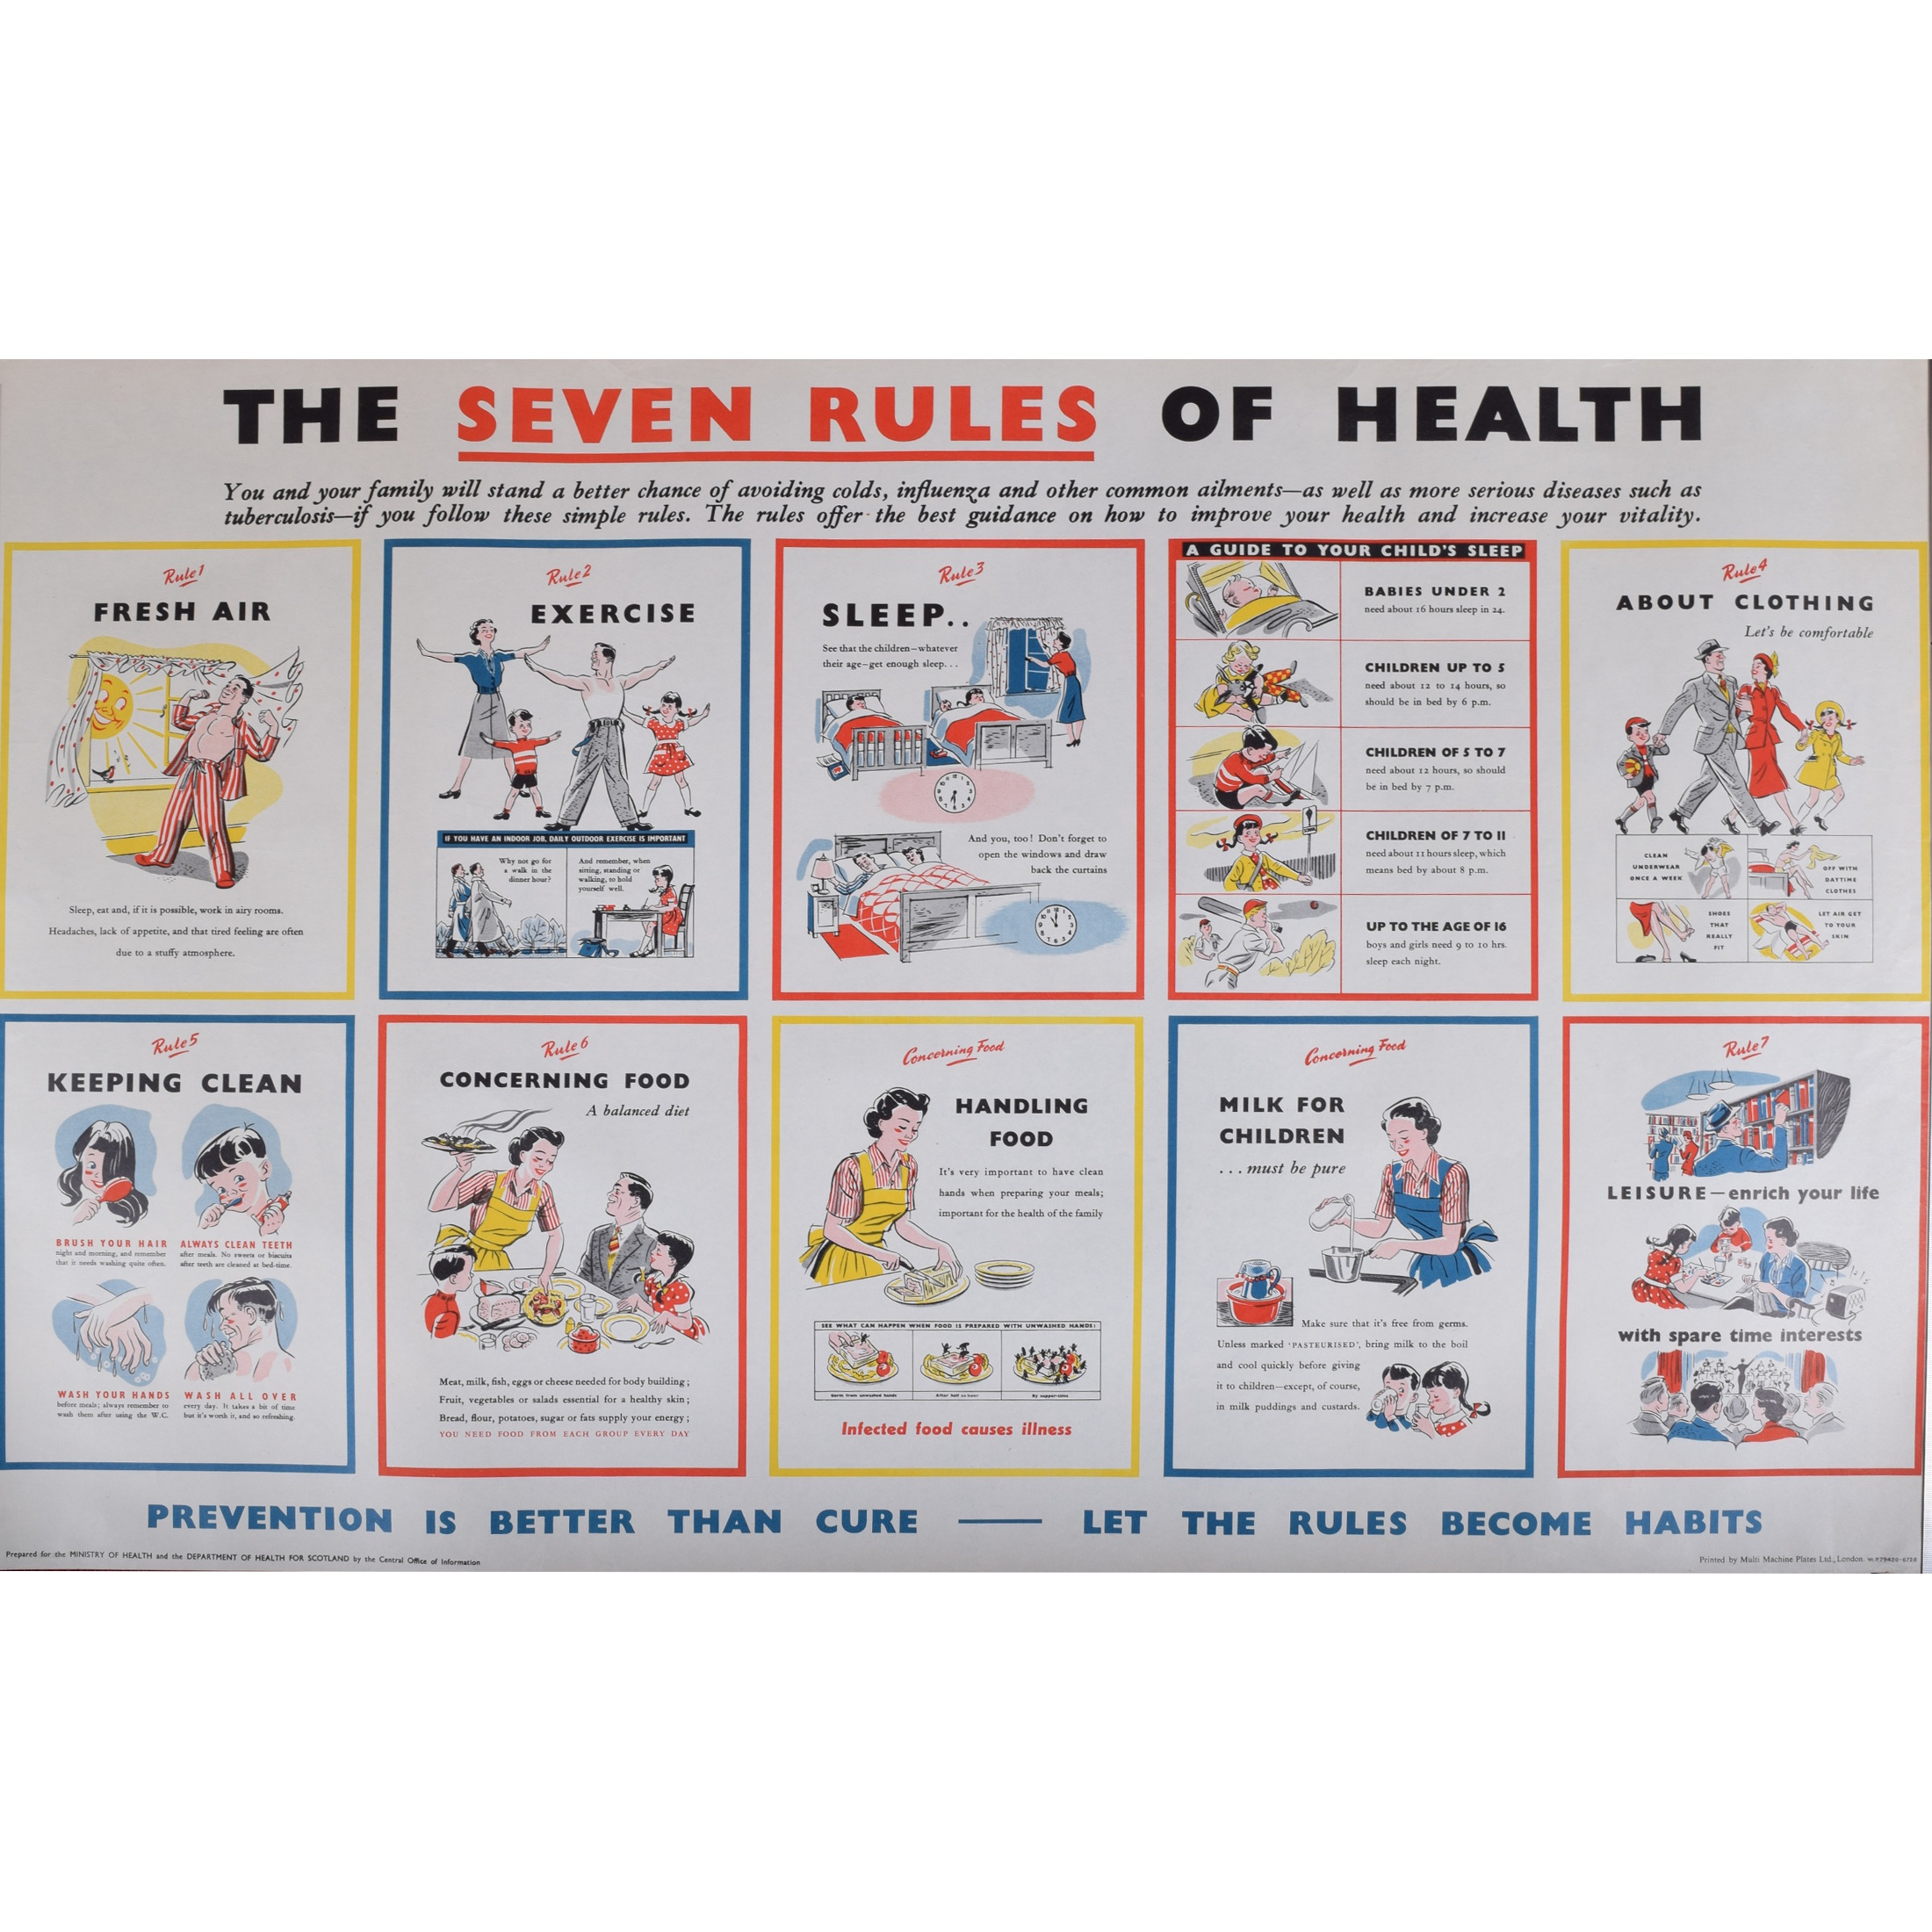 Seven rules of Health original vintage poster